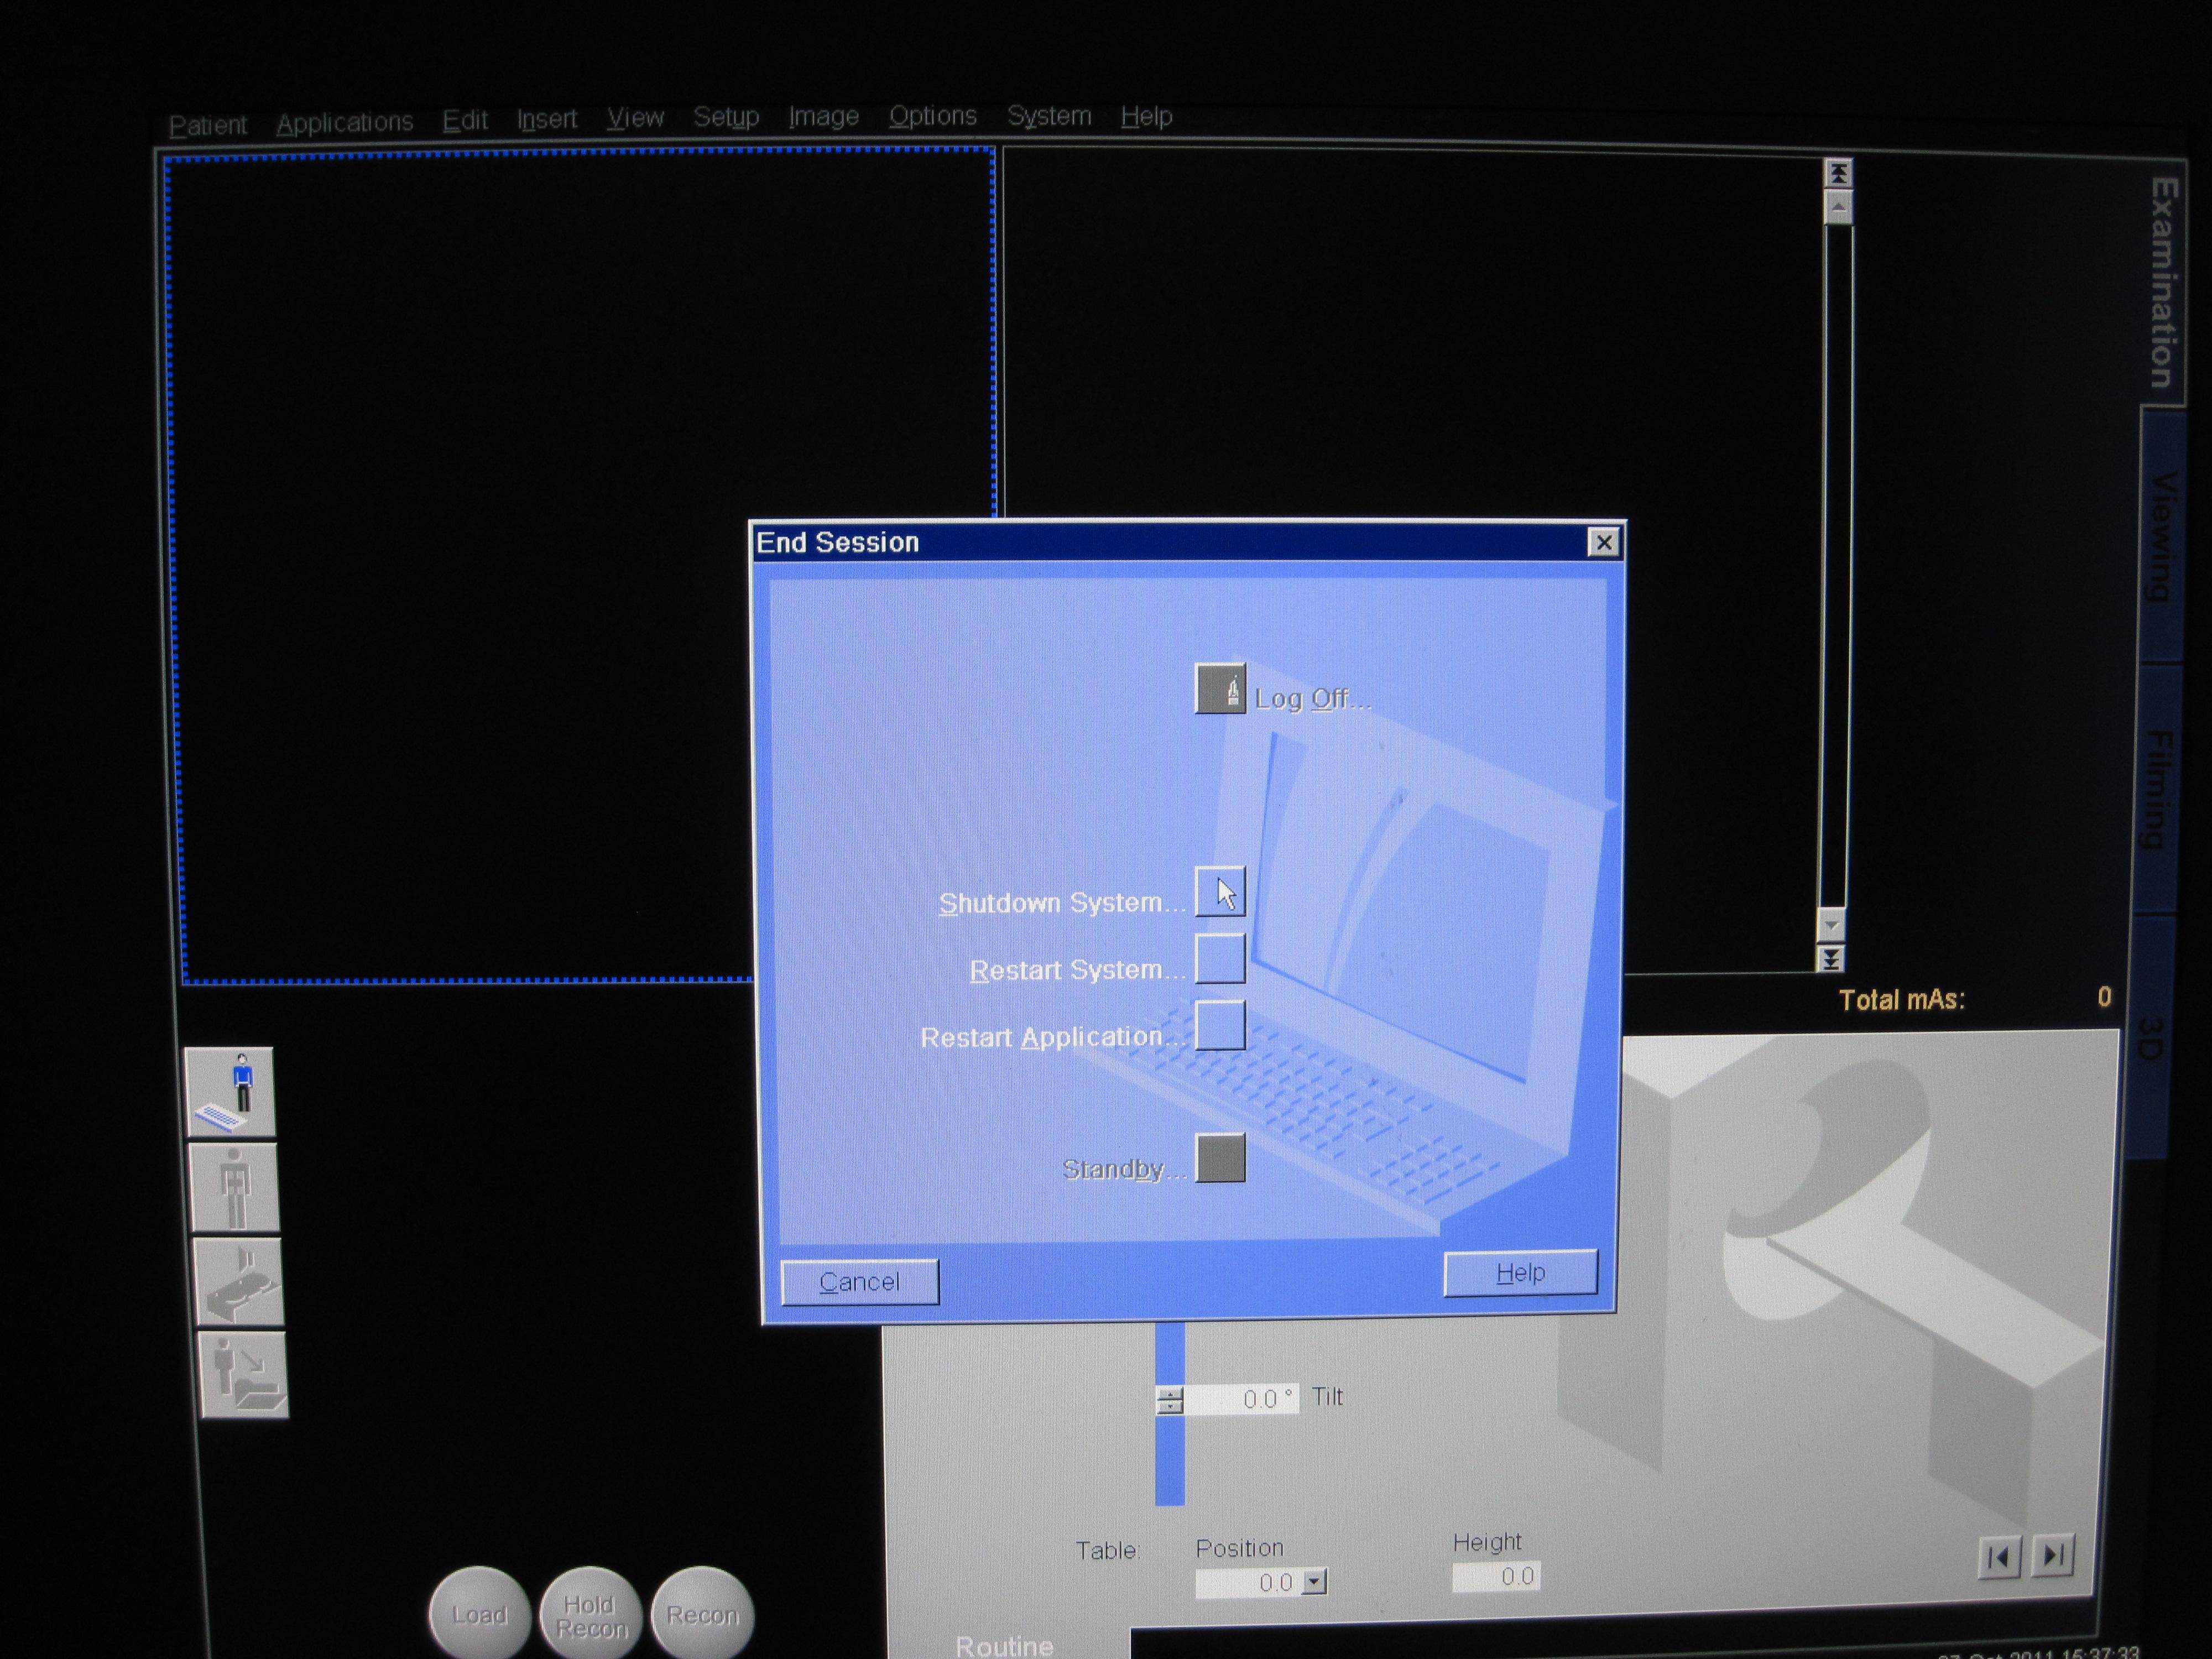 Siemens CT System Shutdown